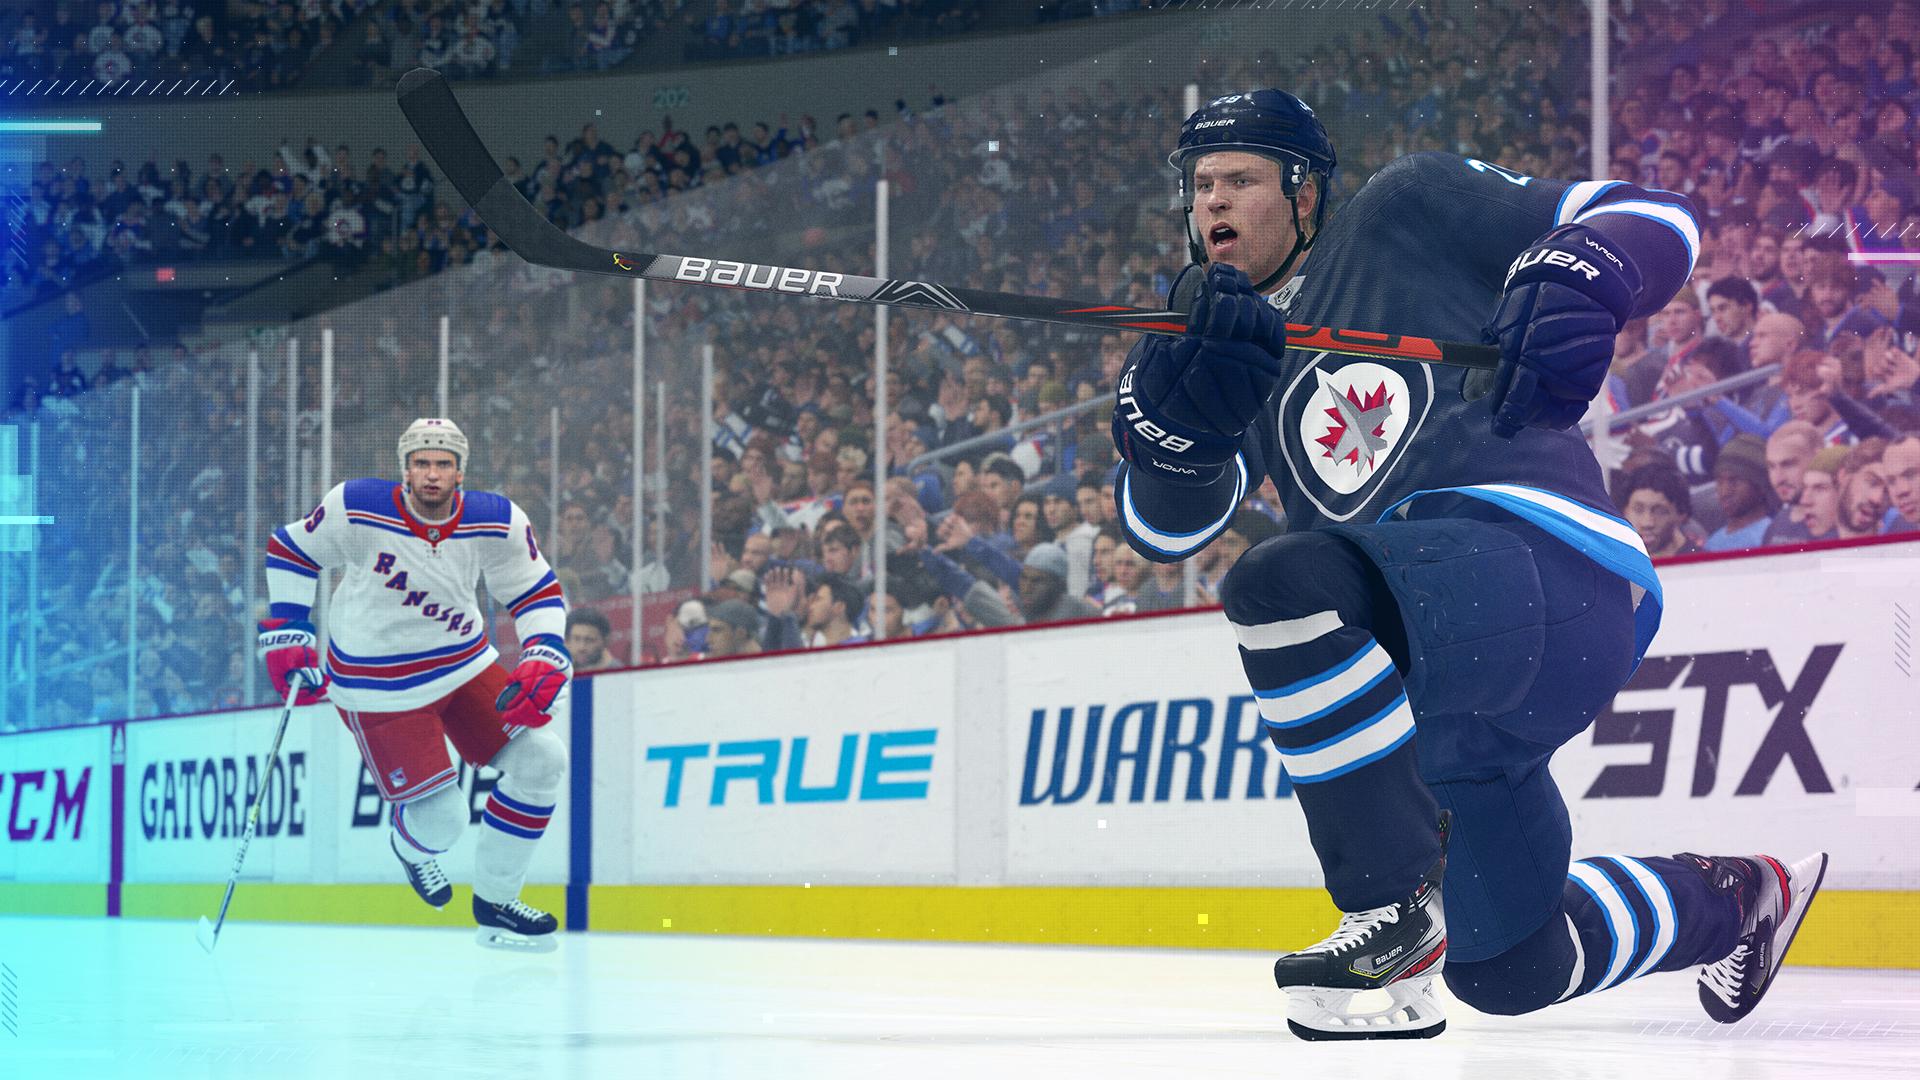 NHL20_Laine_1920x1080.jpg